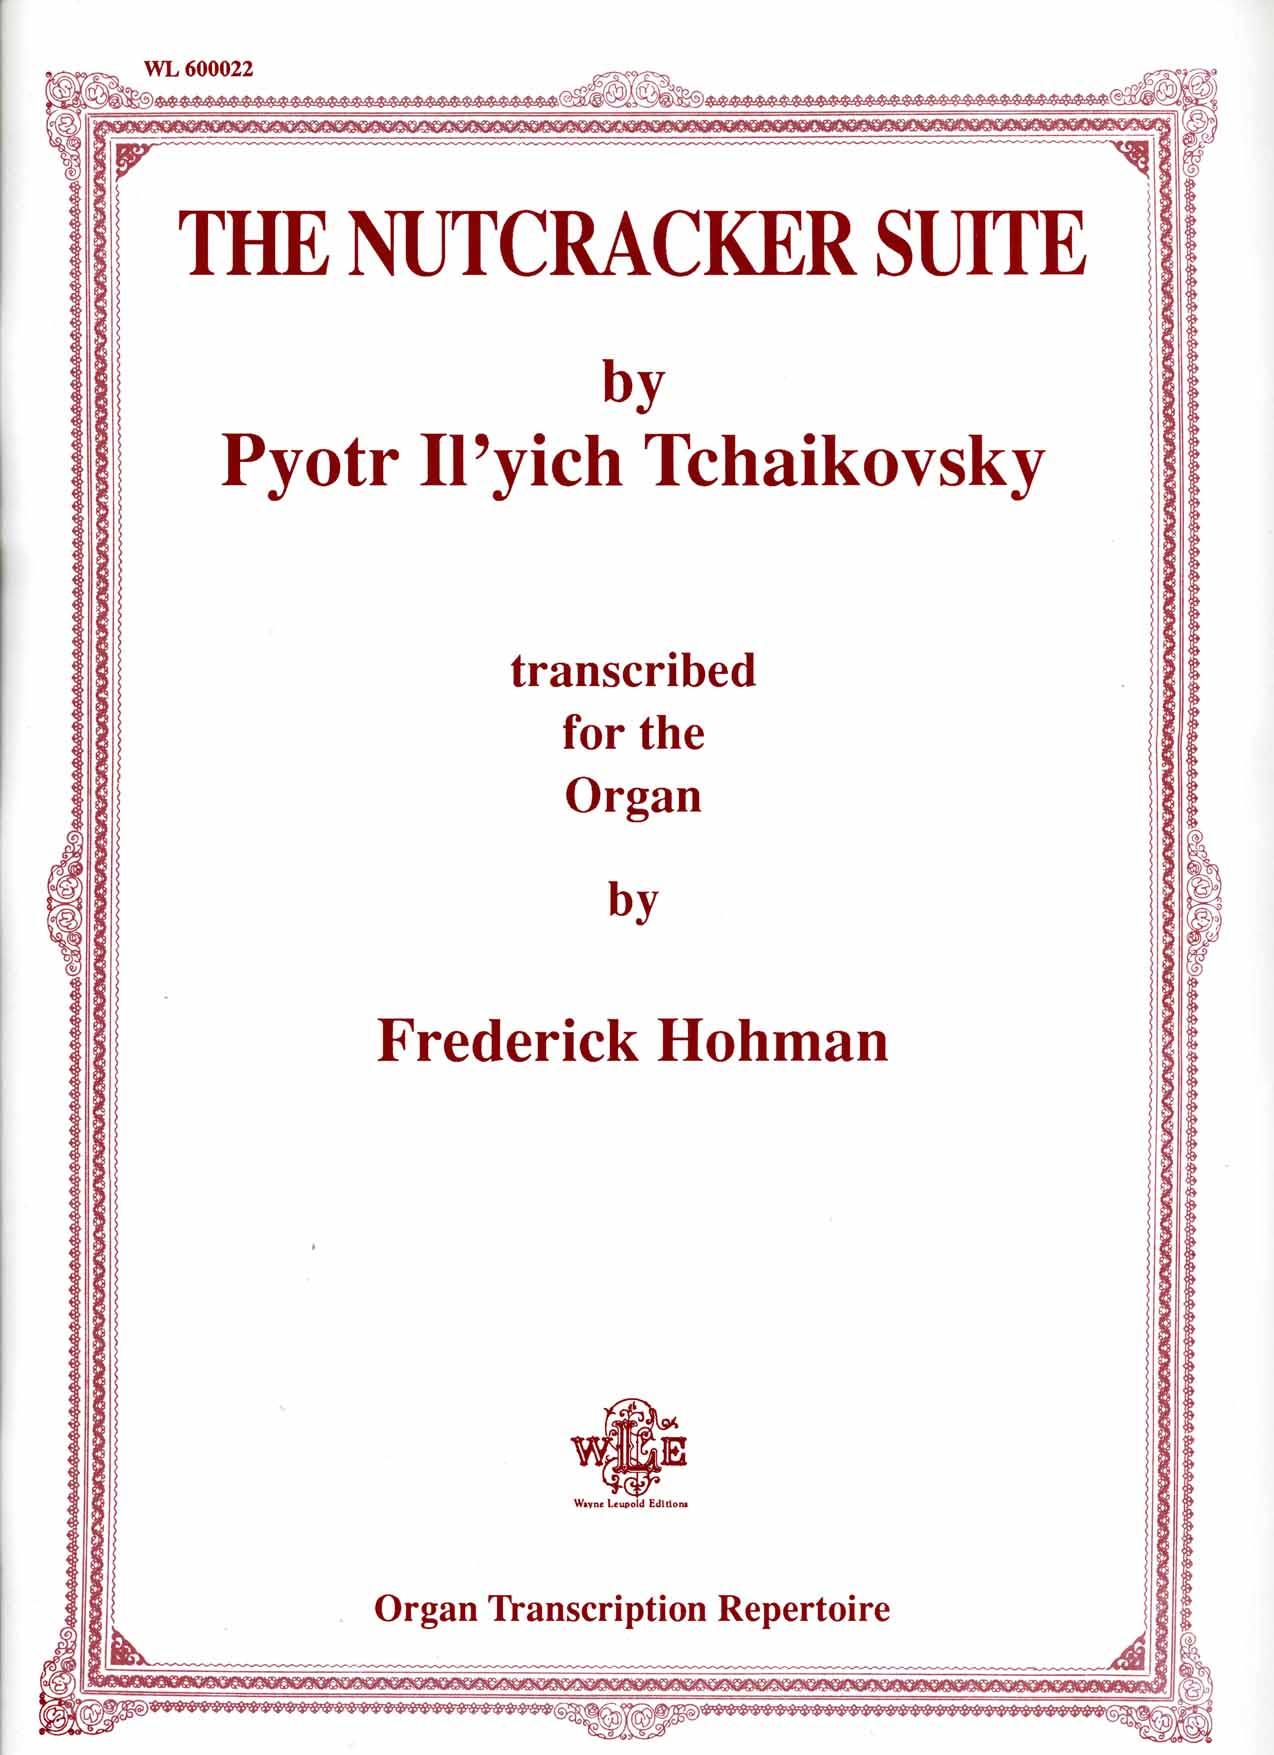 The Nutcracker Suite - Pyotr Il'yich Tchaikovsky (tr. Frederick Hohman)